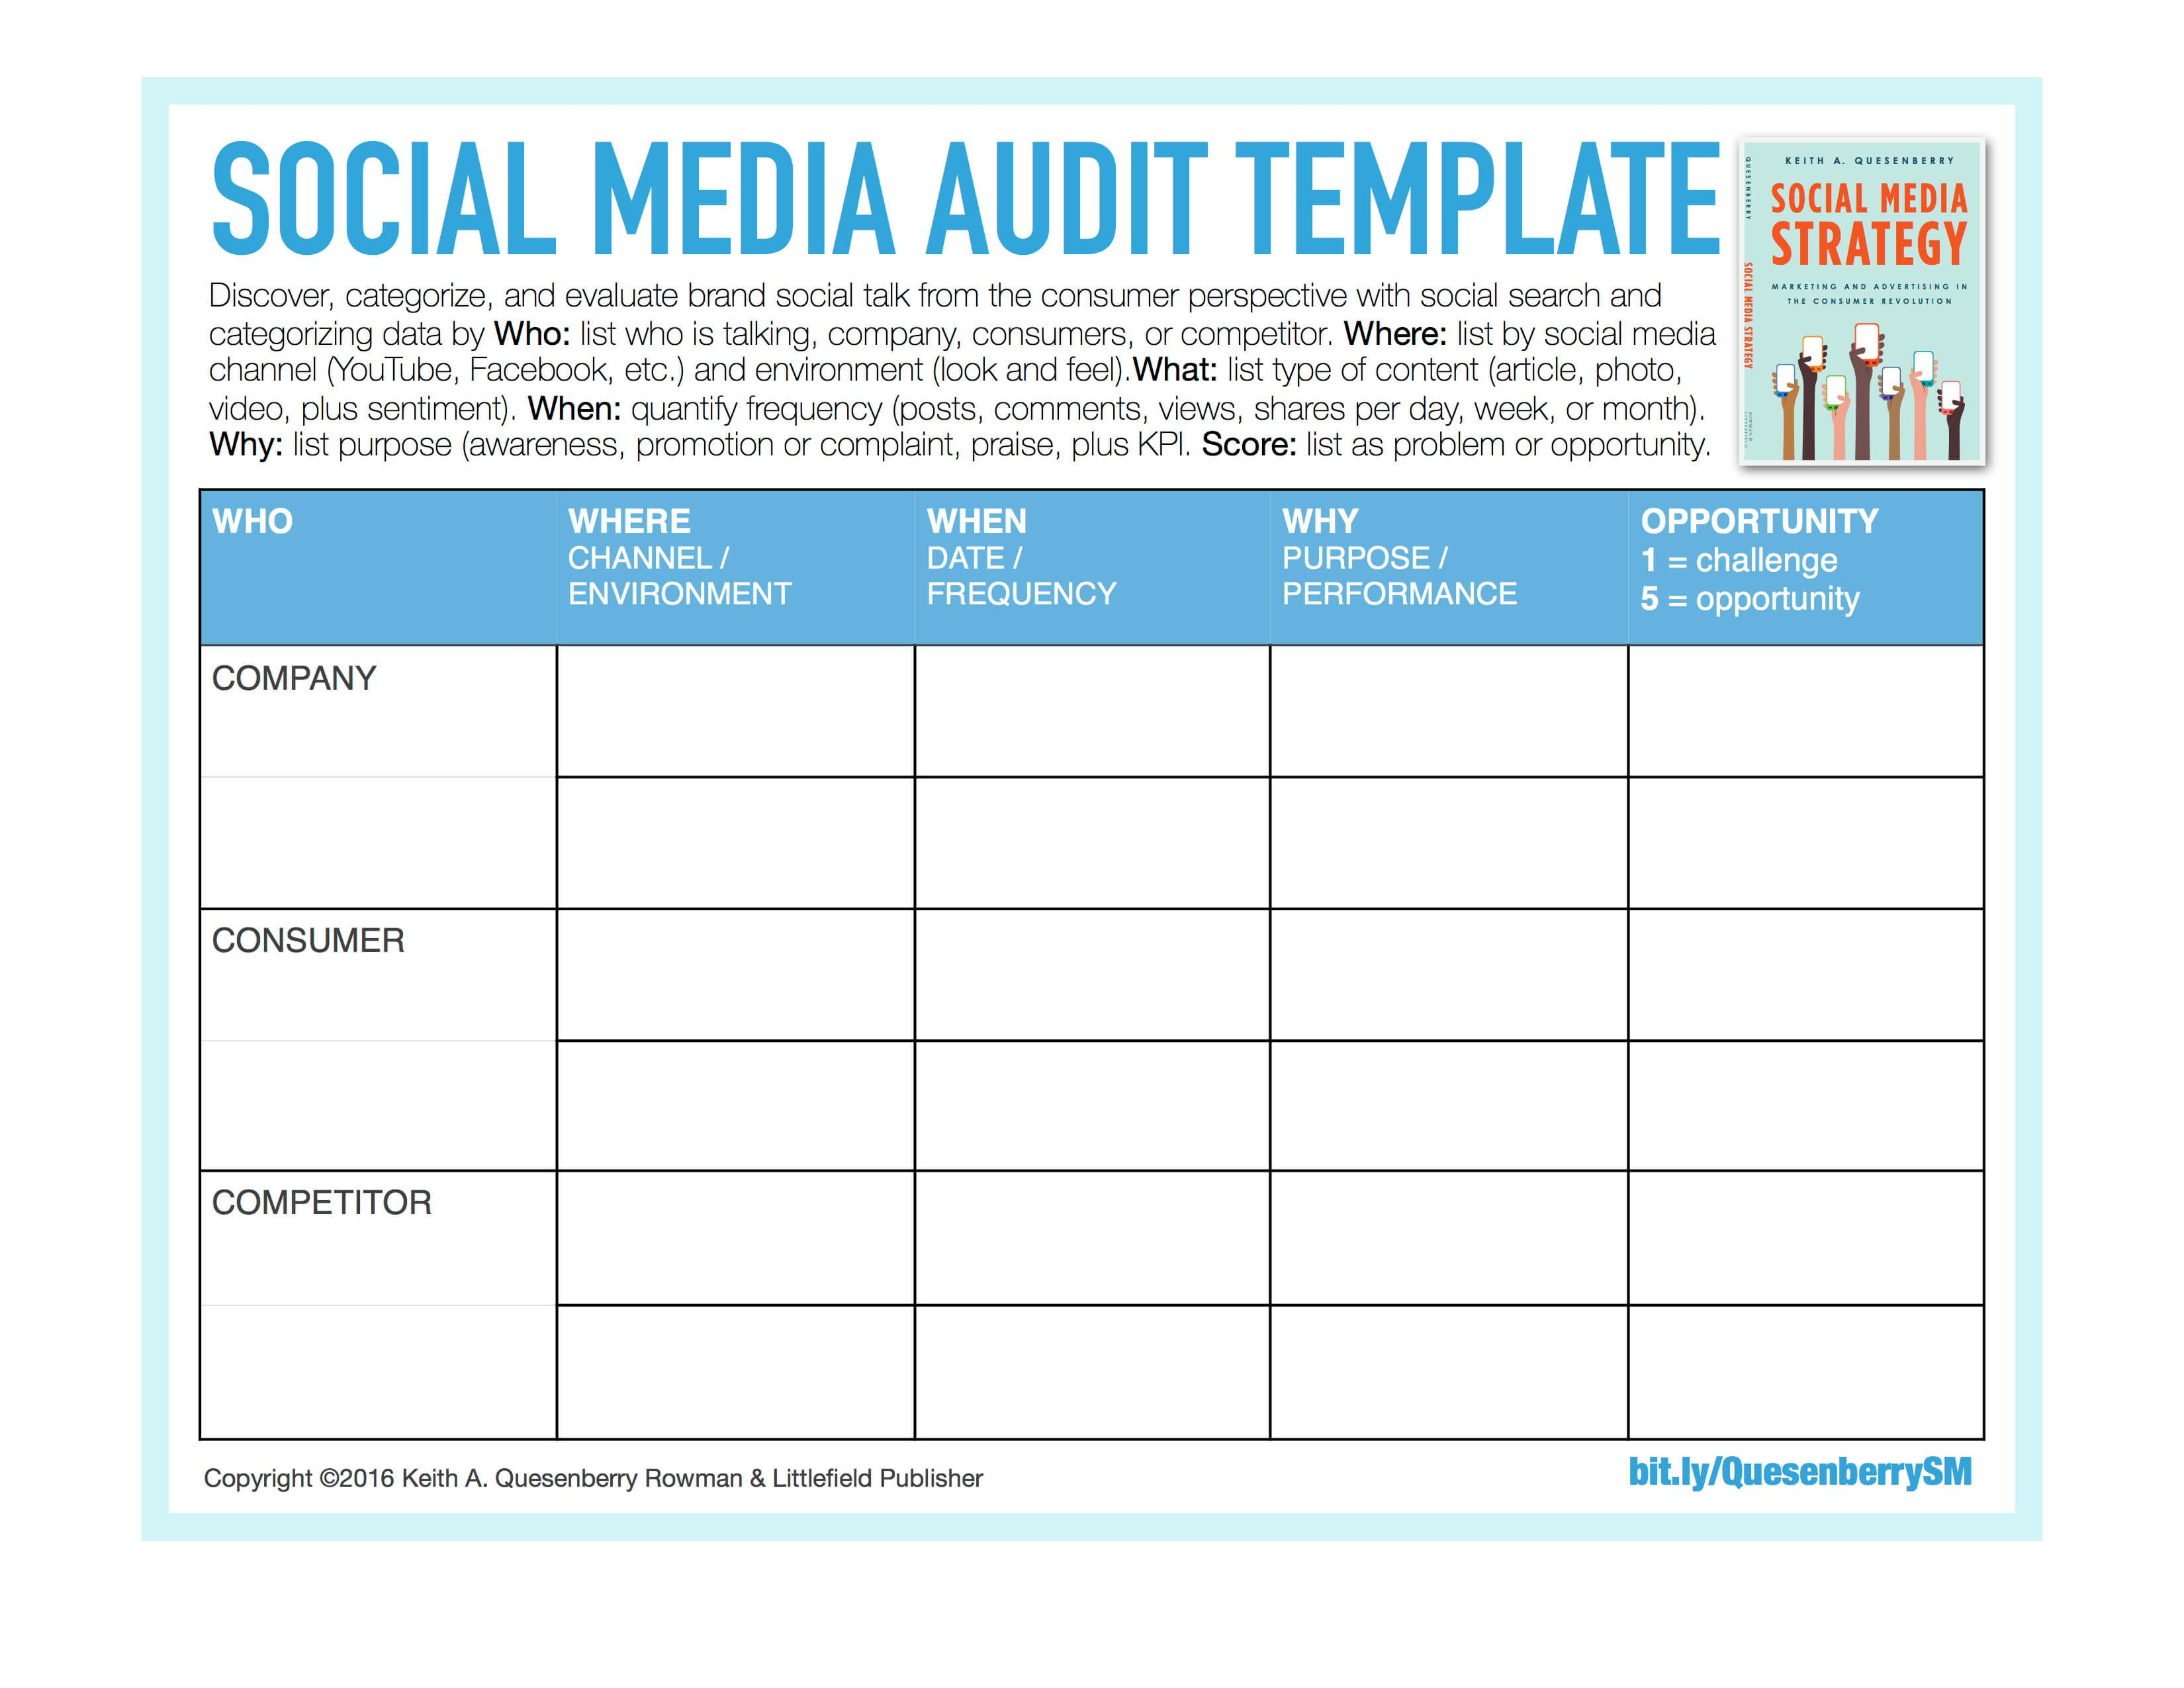 Social Media Templates Social media, Social media report